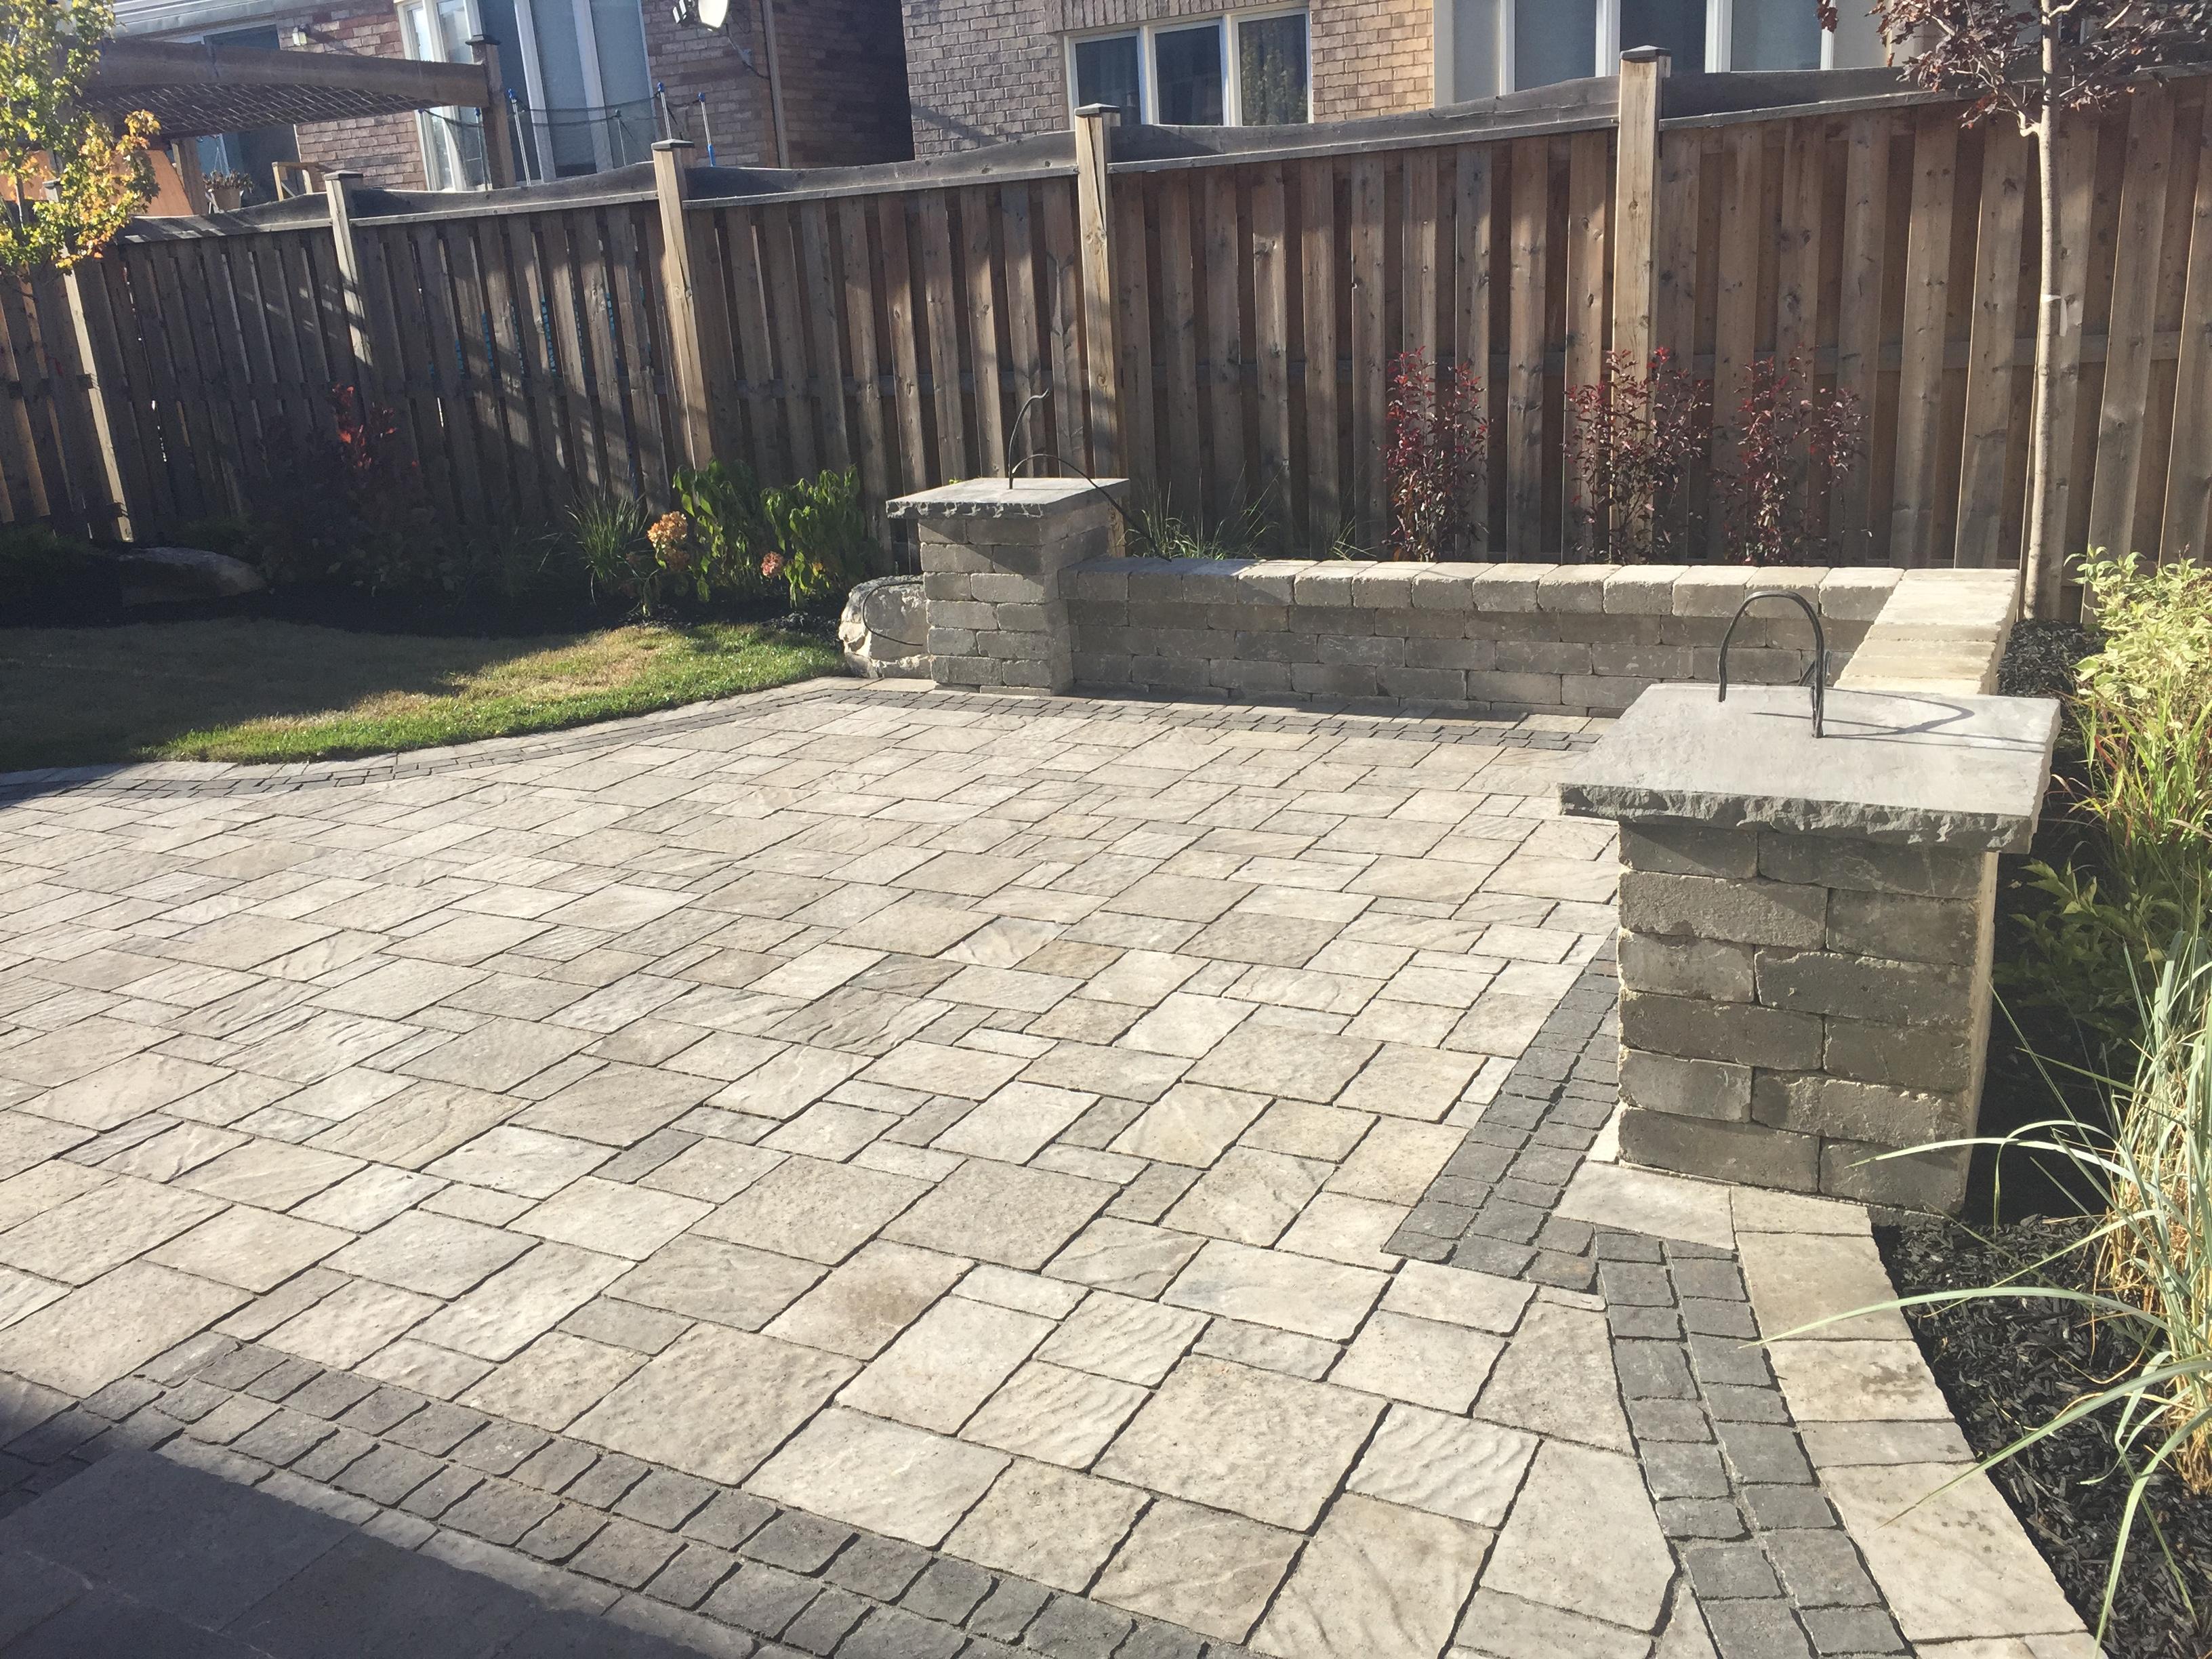 Backyard Interlocking Stone Patio With Corner Wall